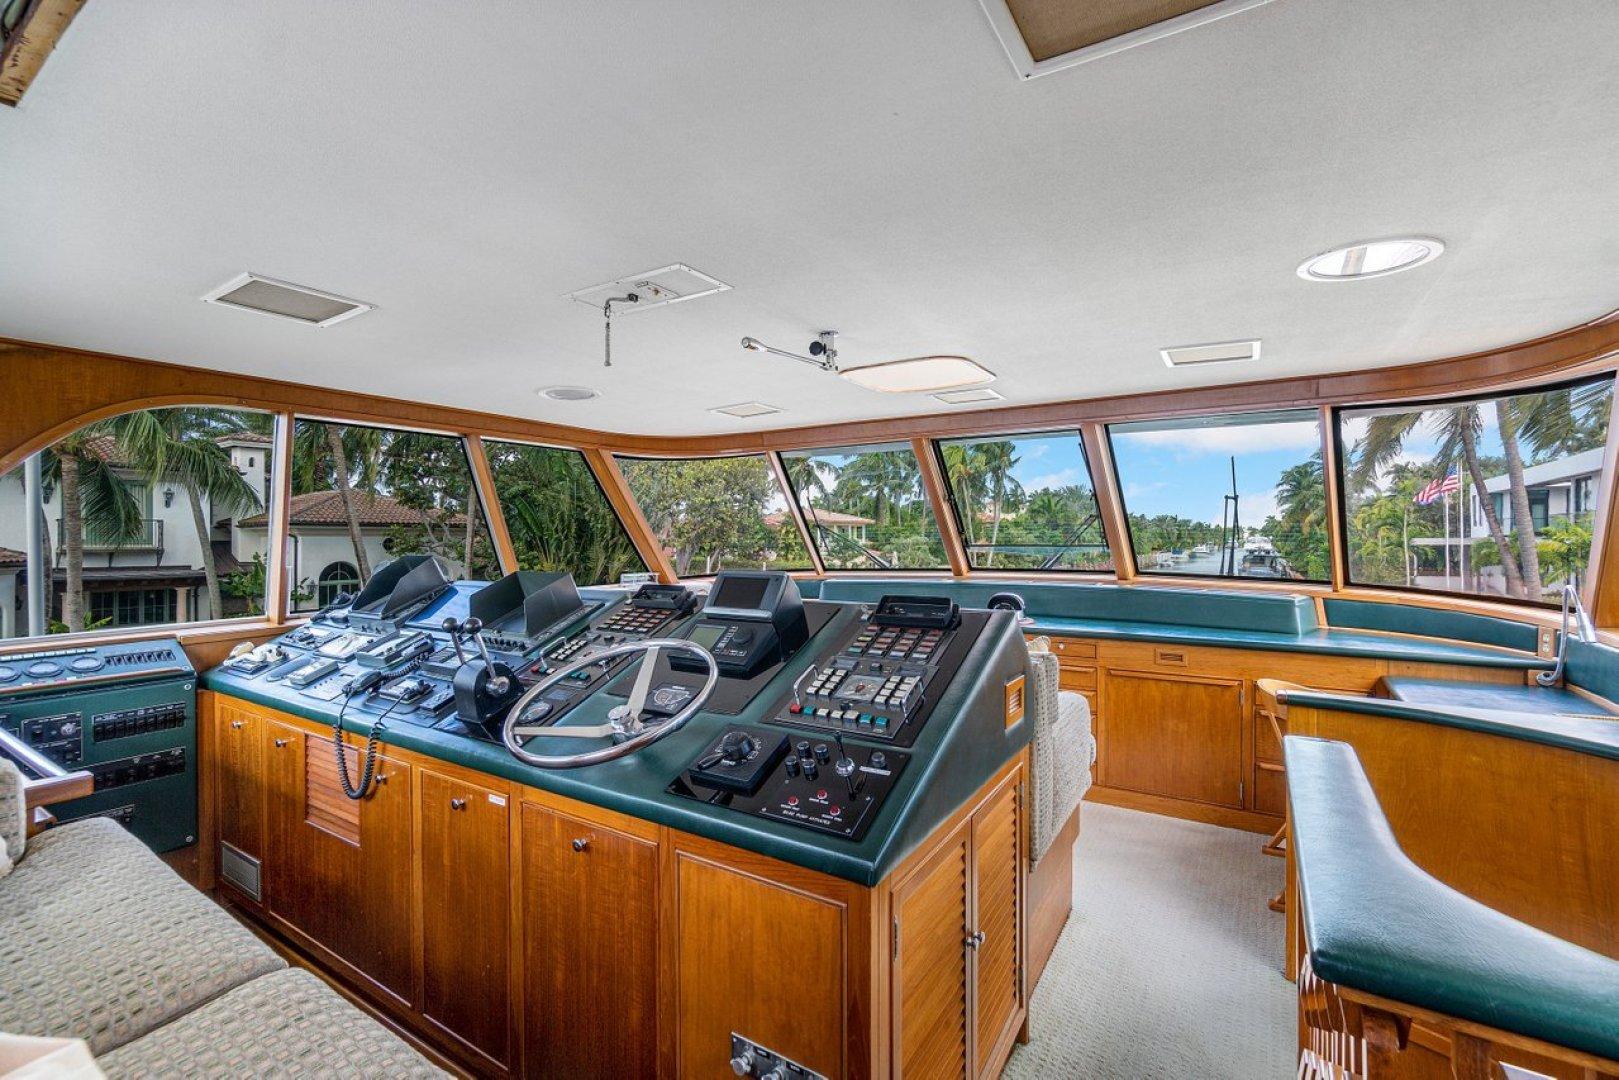 Feadship-Yacht Fisherman 1977-Impetuous Fort Lauderdale-Florida-United States-1575477 | Thumbnail